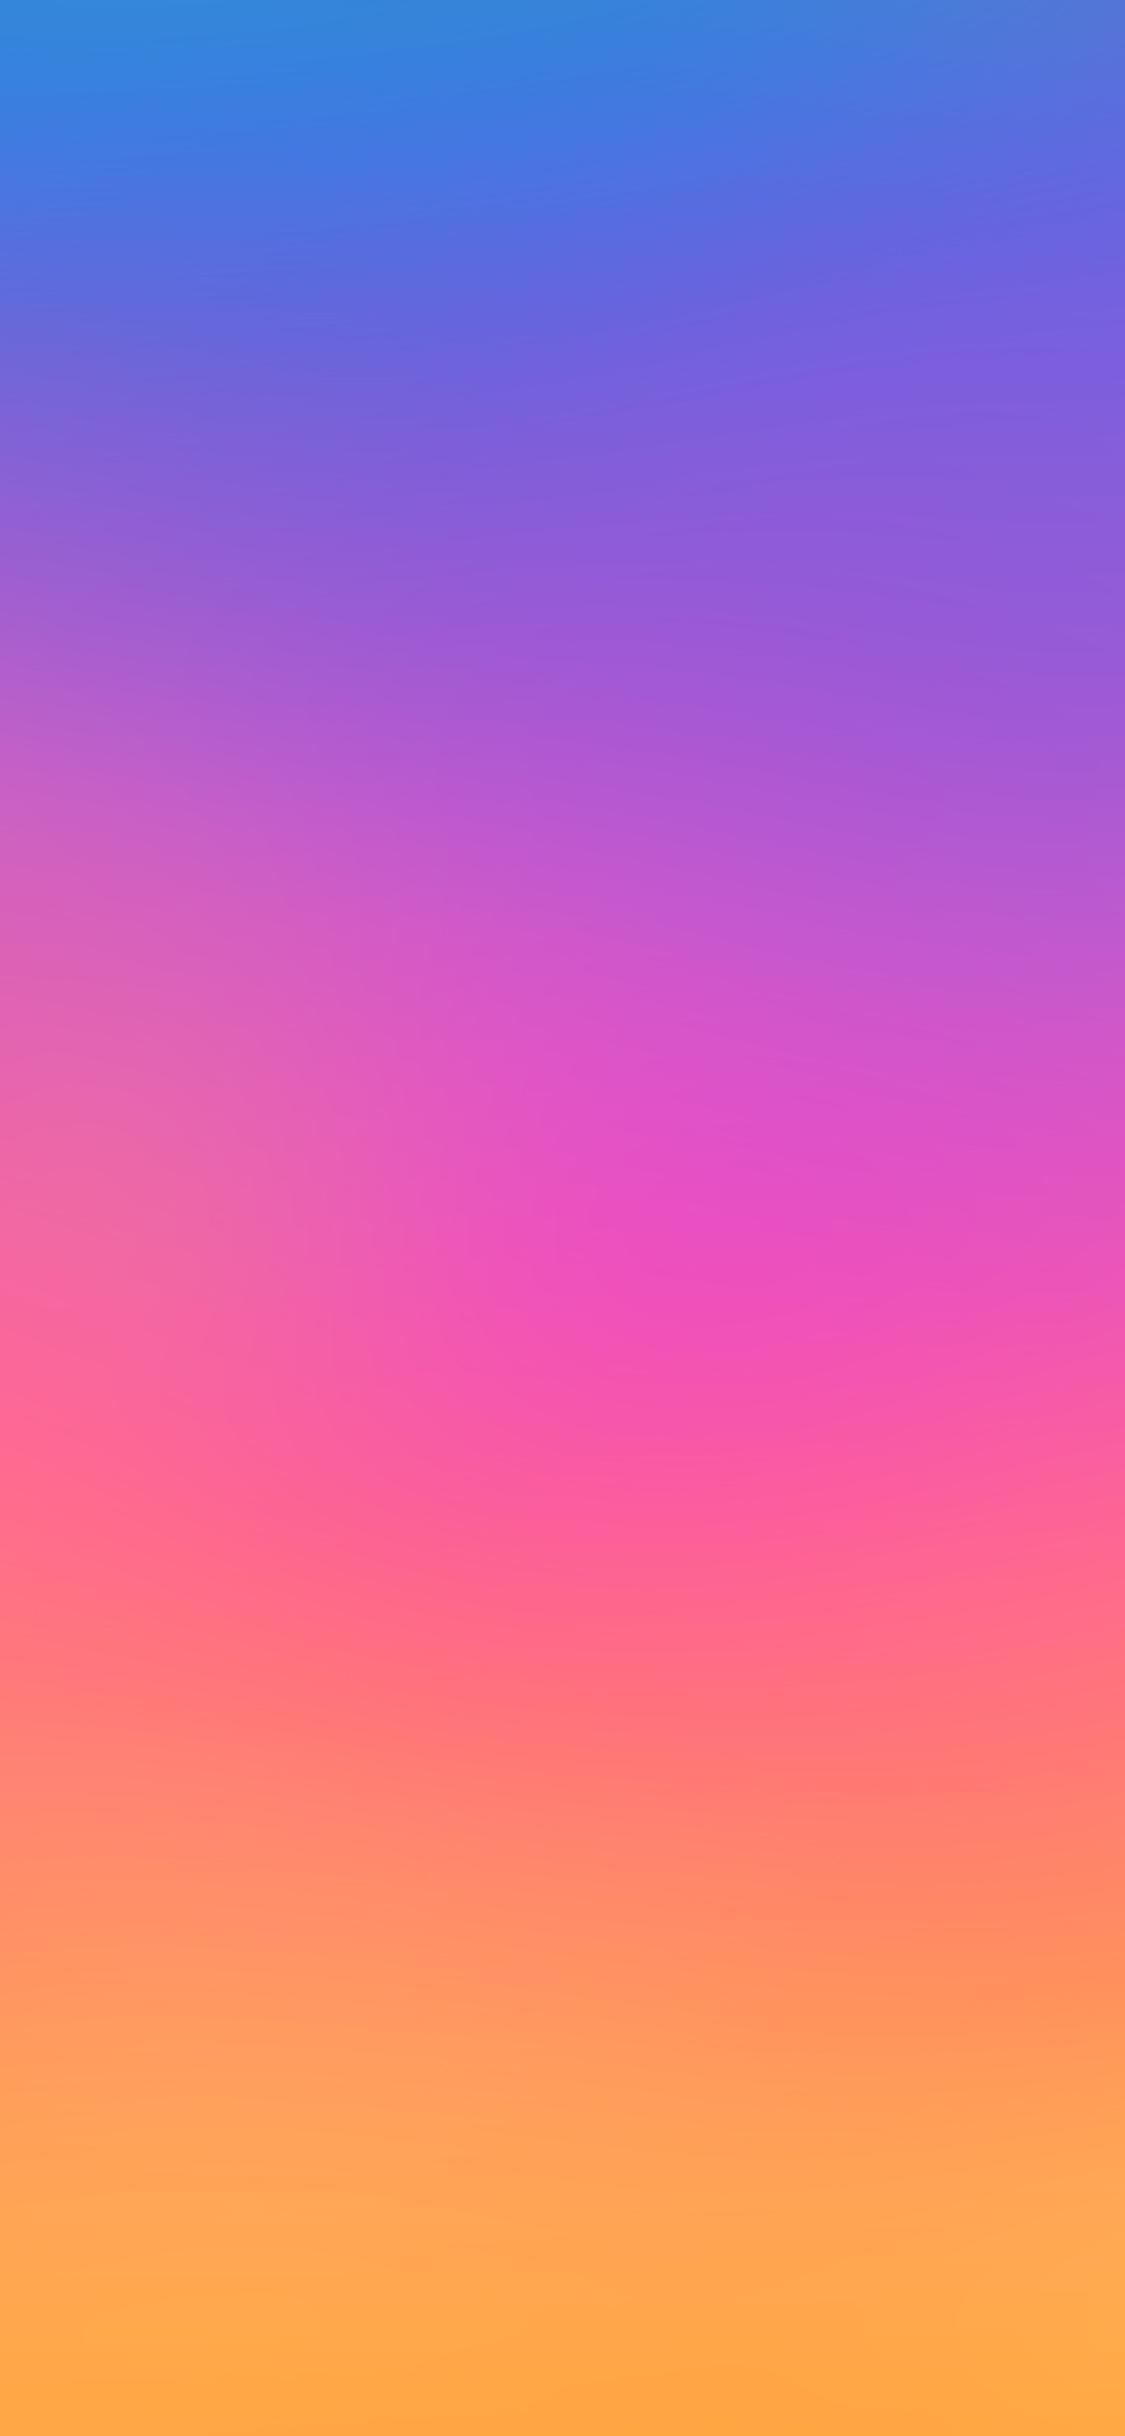 iPhoneXpapers.com-Apple-iPhone-wallpaper-sk25-romantic-sky-purple-red-yellow-blur-gradation